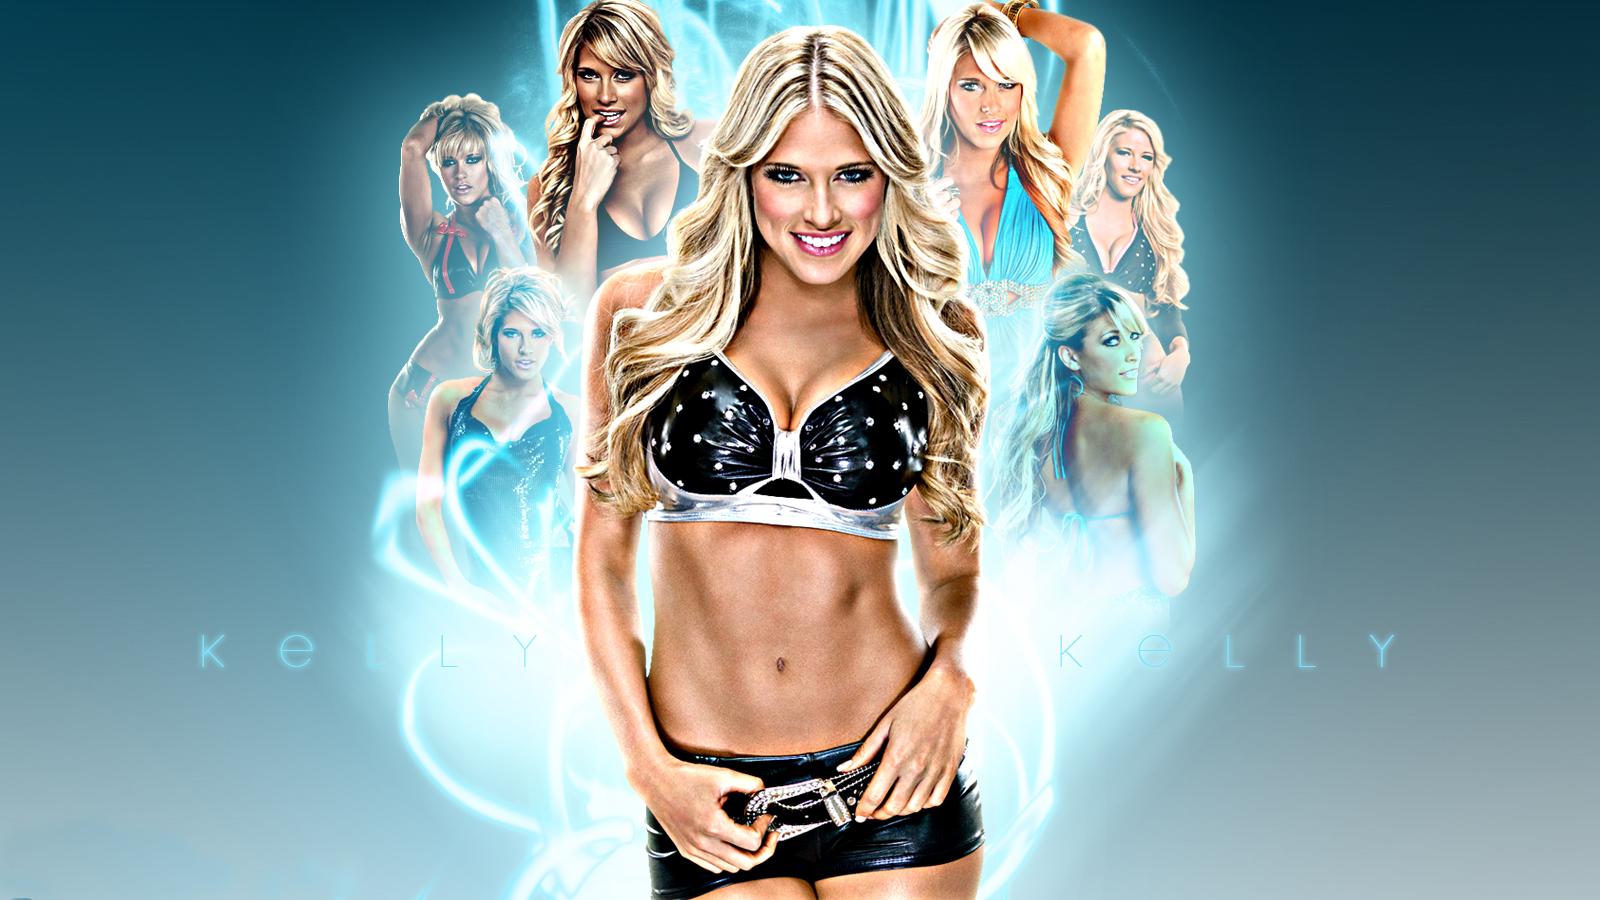 wrestling super stars: kelly kelly latest hd wallpapers 2013